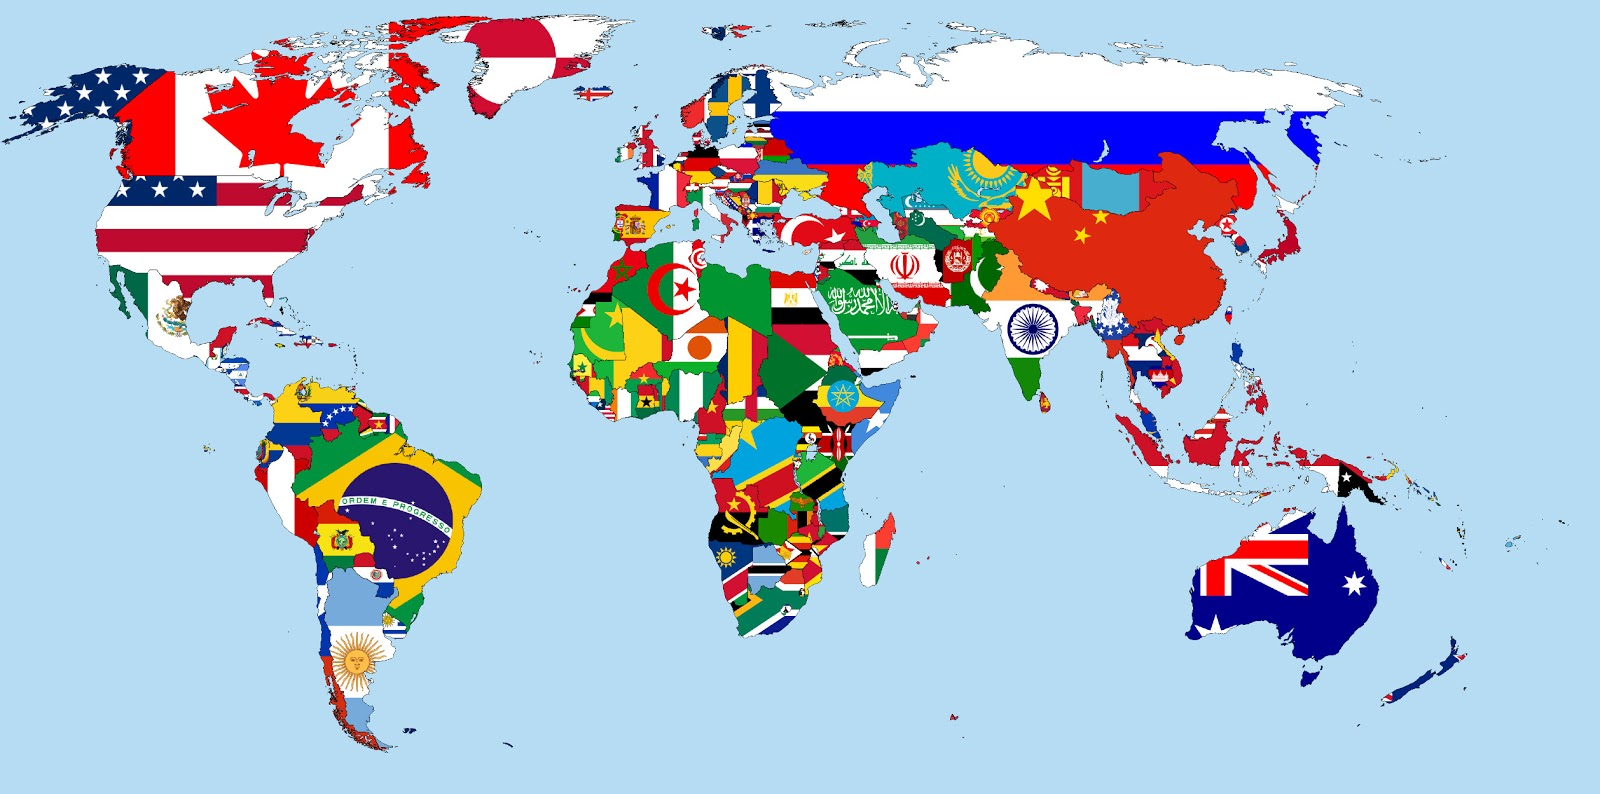 https://lh3.ggpht.com/-IrLbOUUN_38/UiMQe-rUz1I/AAAAAAAAPYI/AwgleH9JM20/s1600/Flags_of_the_World_by_Condottiero.jpg